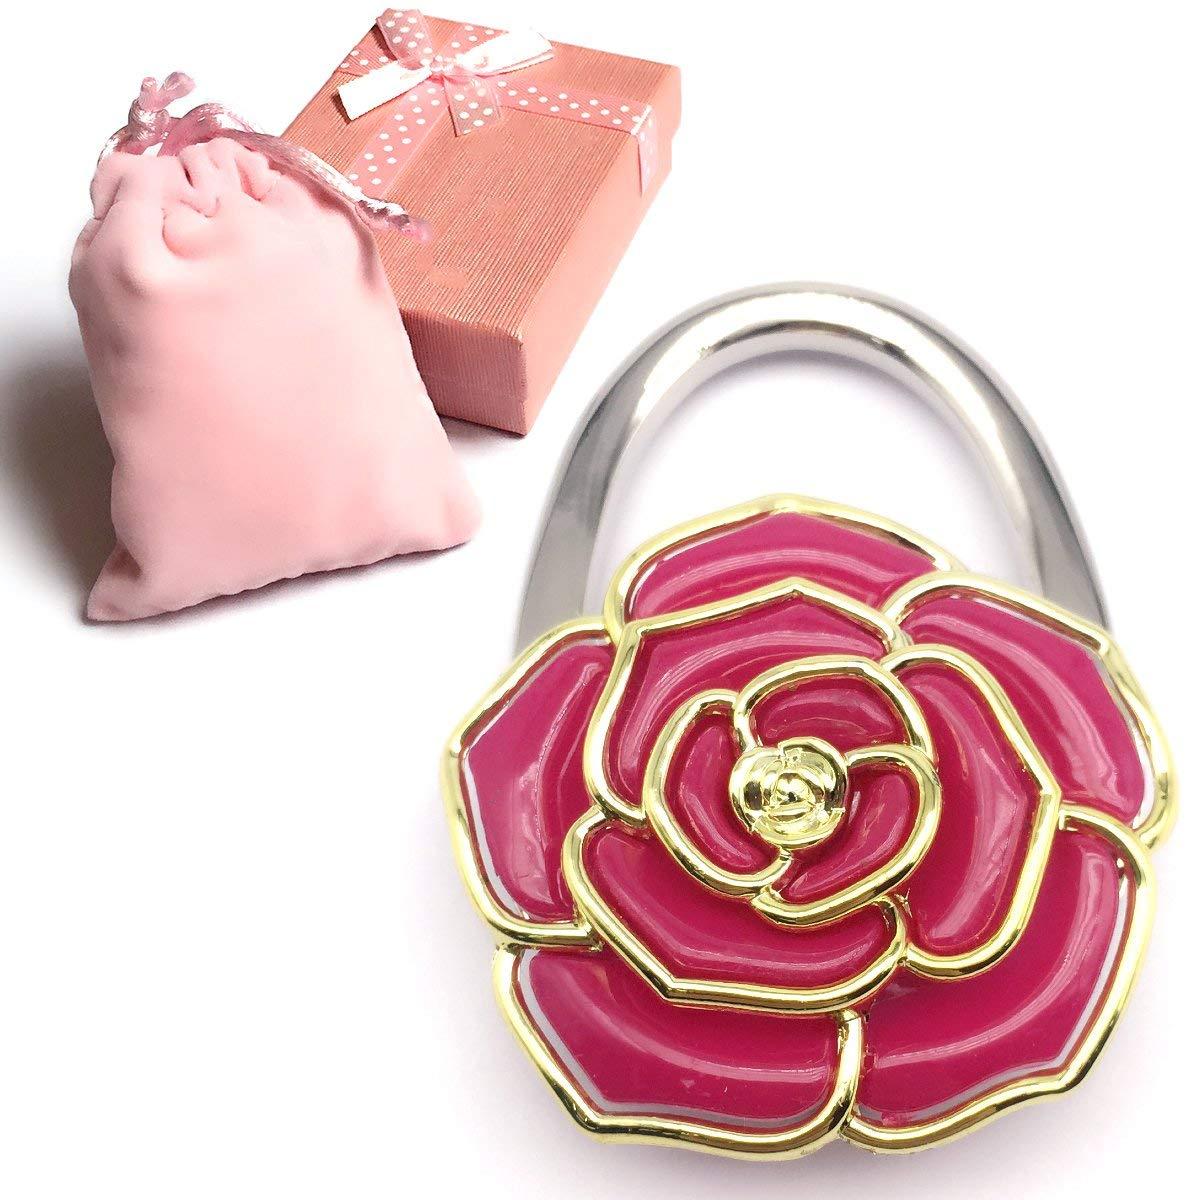 Elesa Miracle Purse Hook8 Choices Foldable Handbag Hanger, Folding Table Hanger, with Velvet Pouch in Gift Box